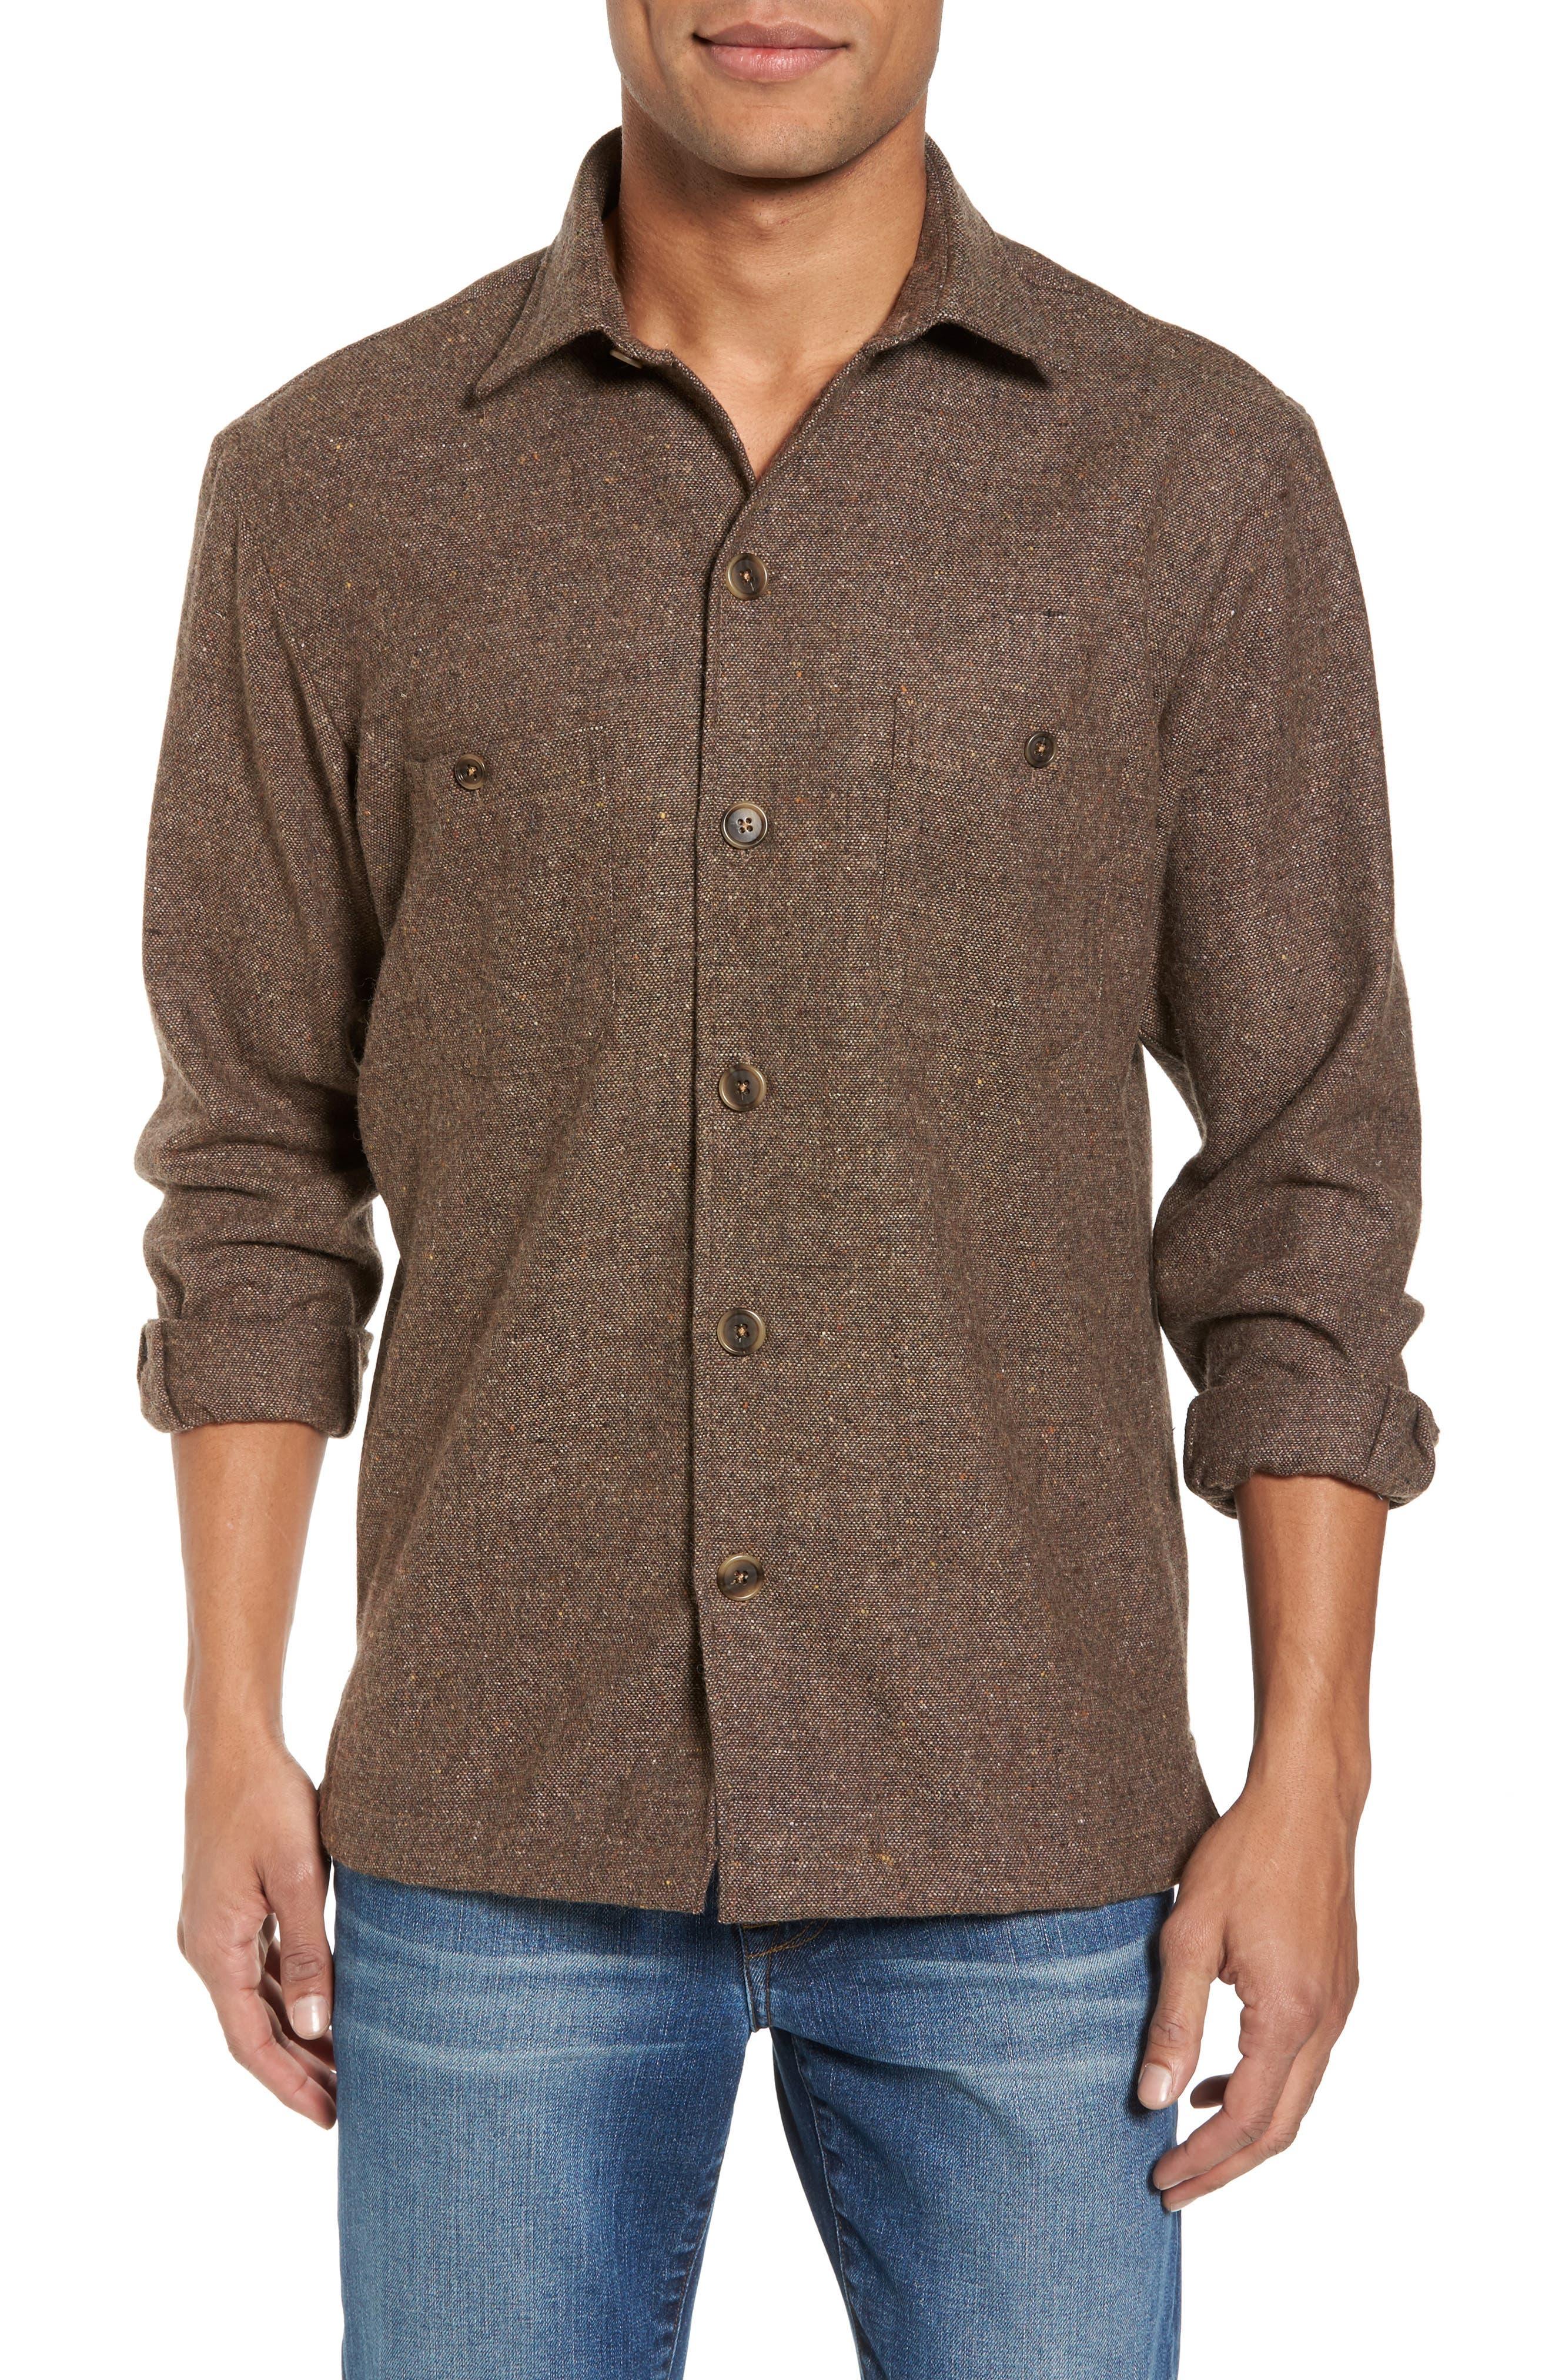 New England Shirt Co. Slim Fit Wool Sport Shirt